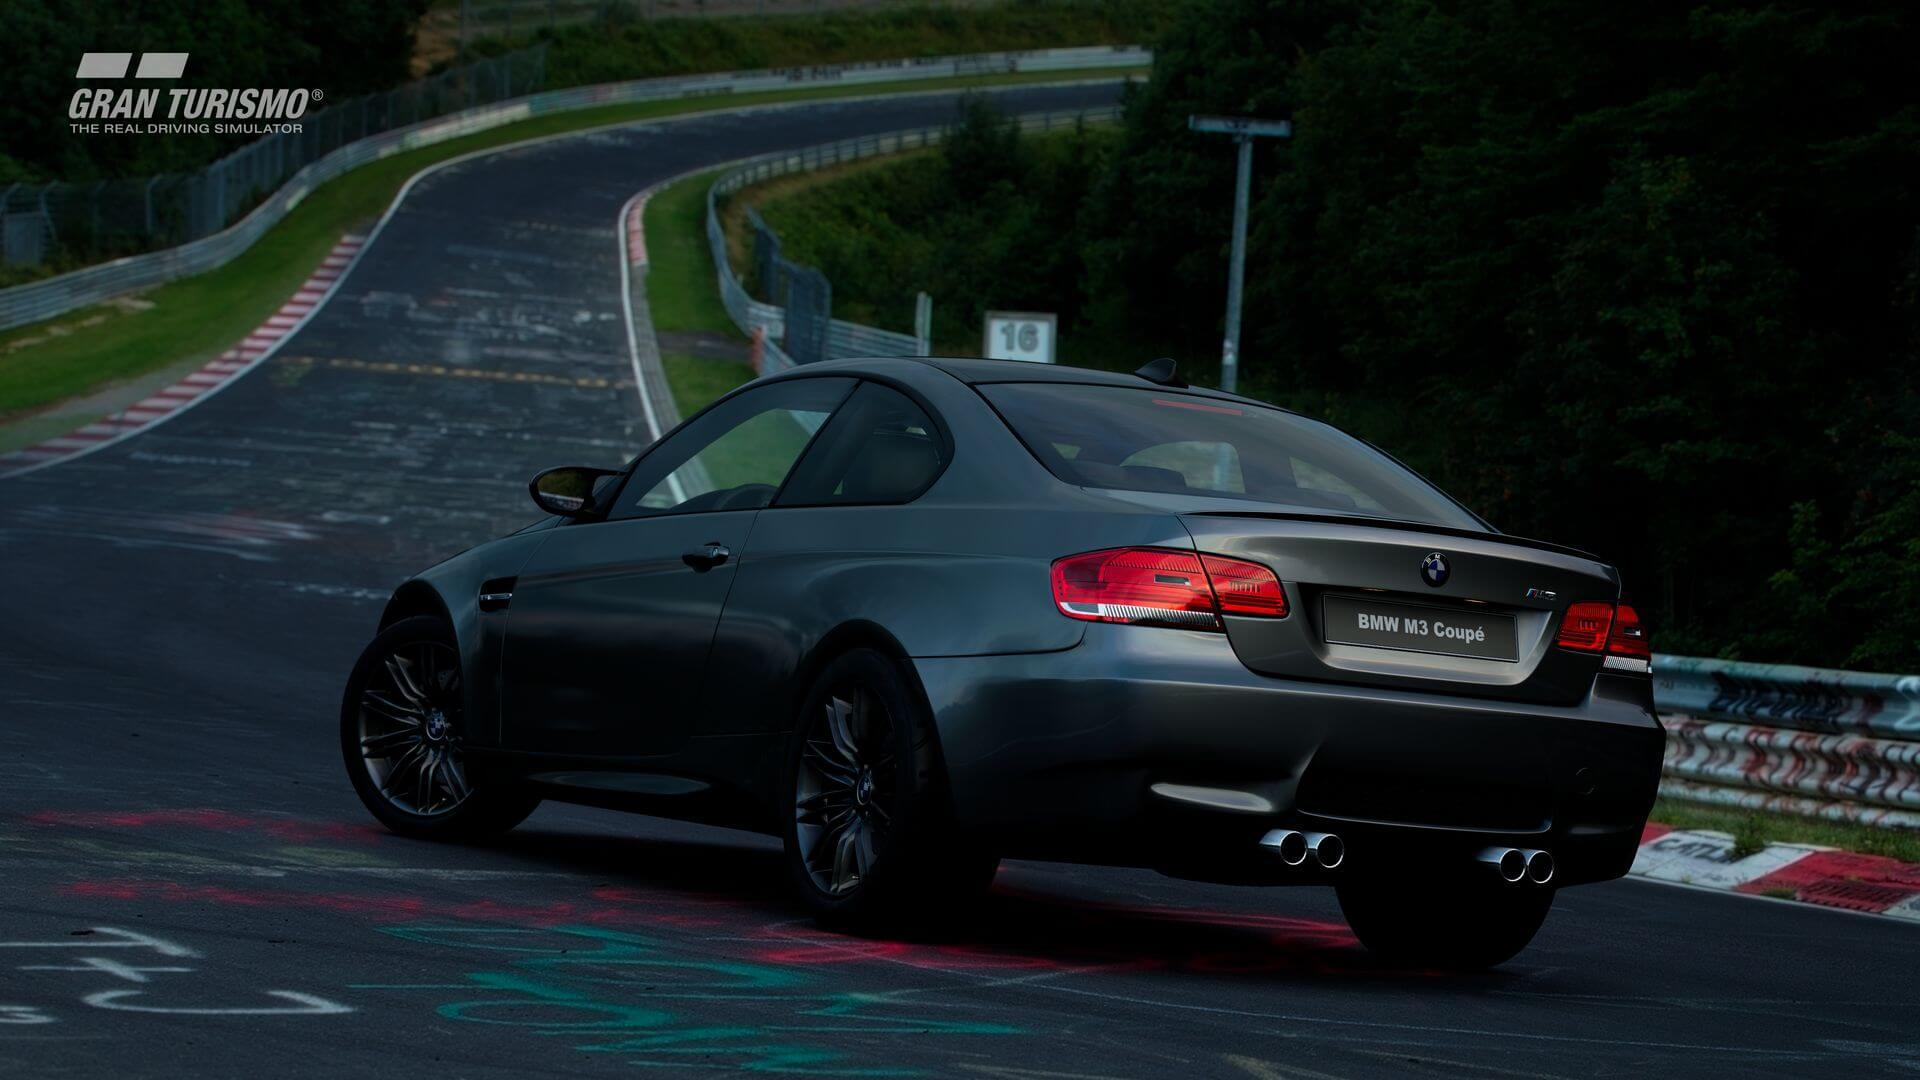 Gran-Turismo-Sport-2007-BMW-M3-Coupe-03.